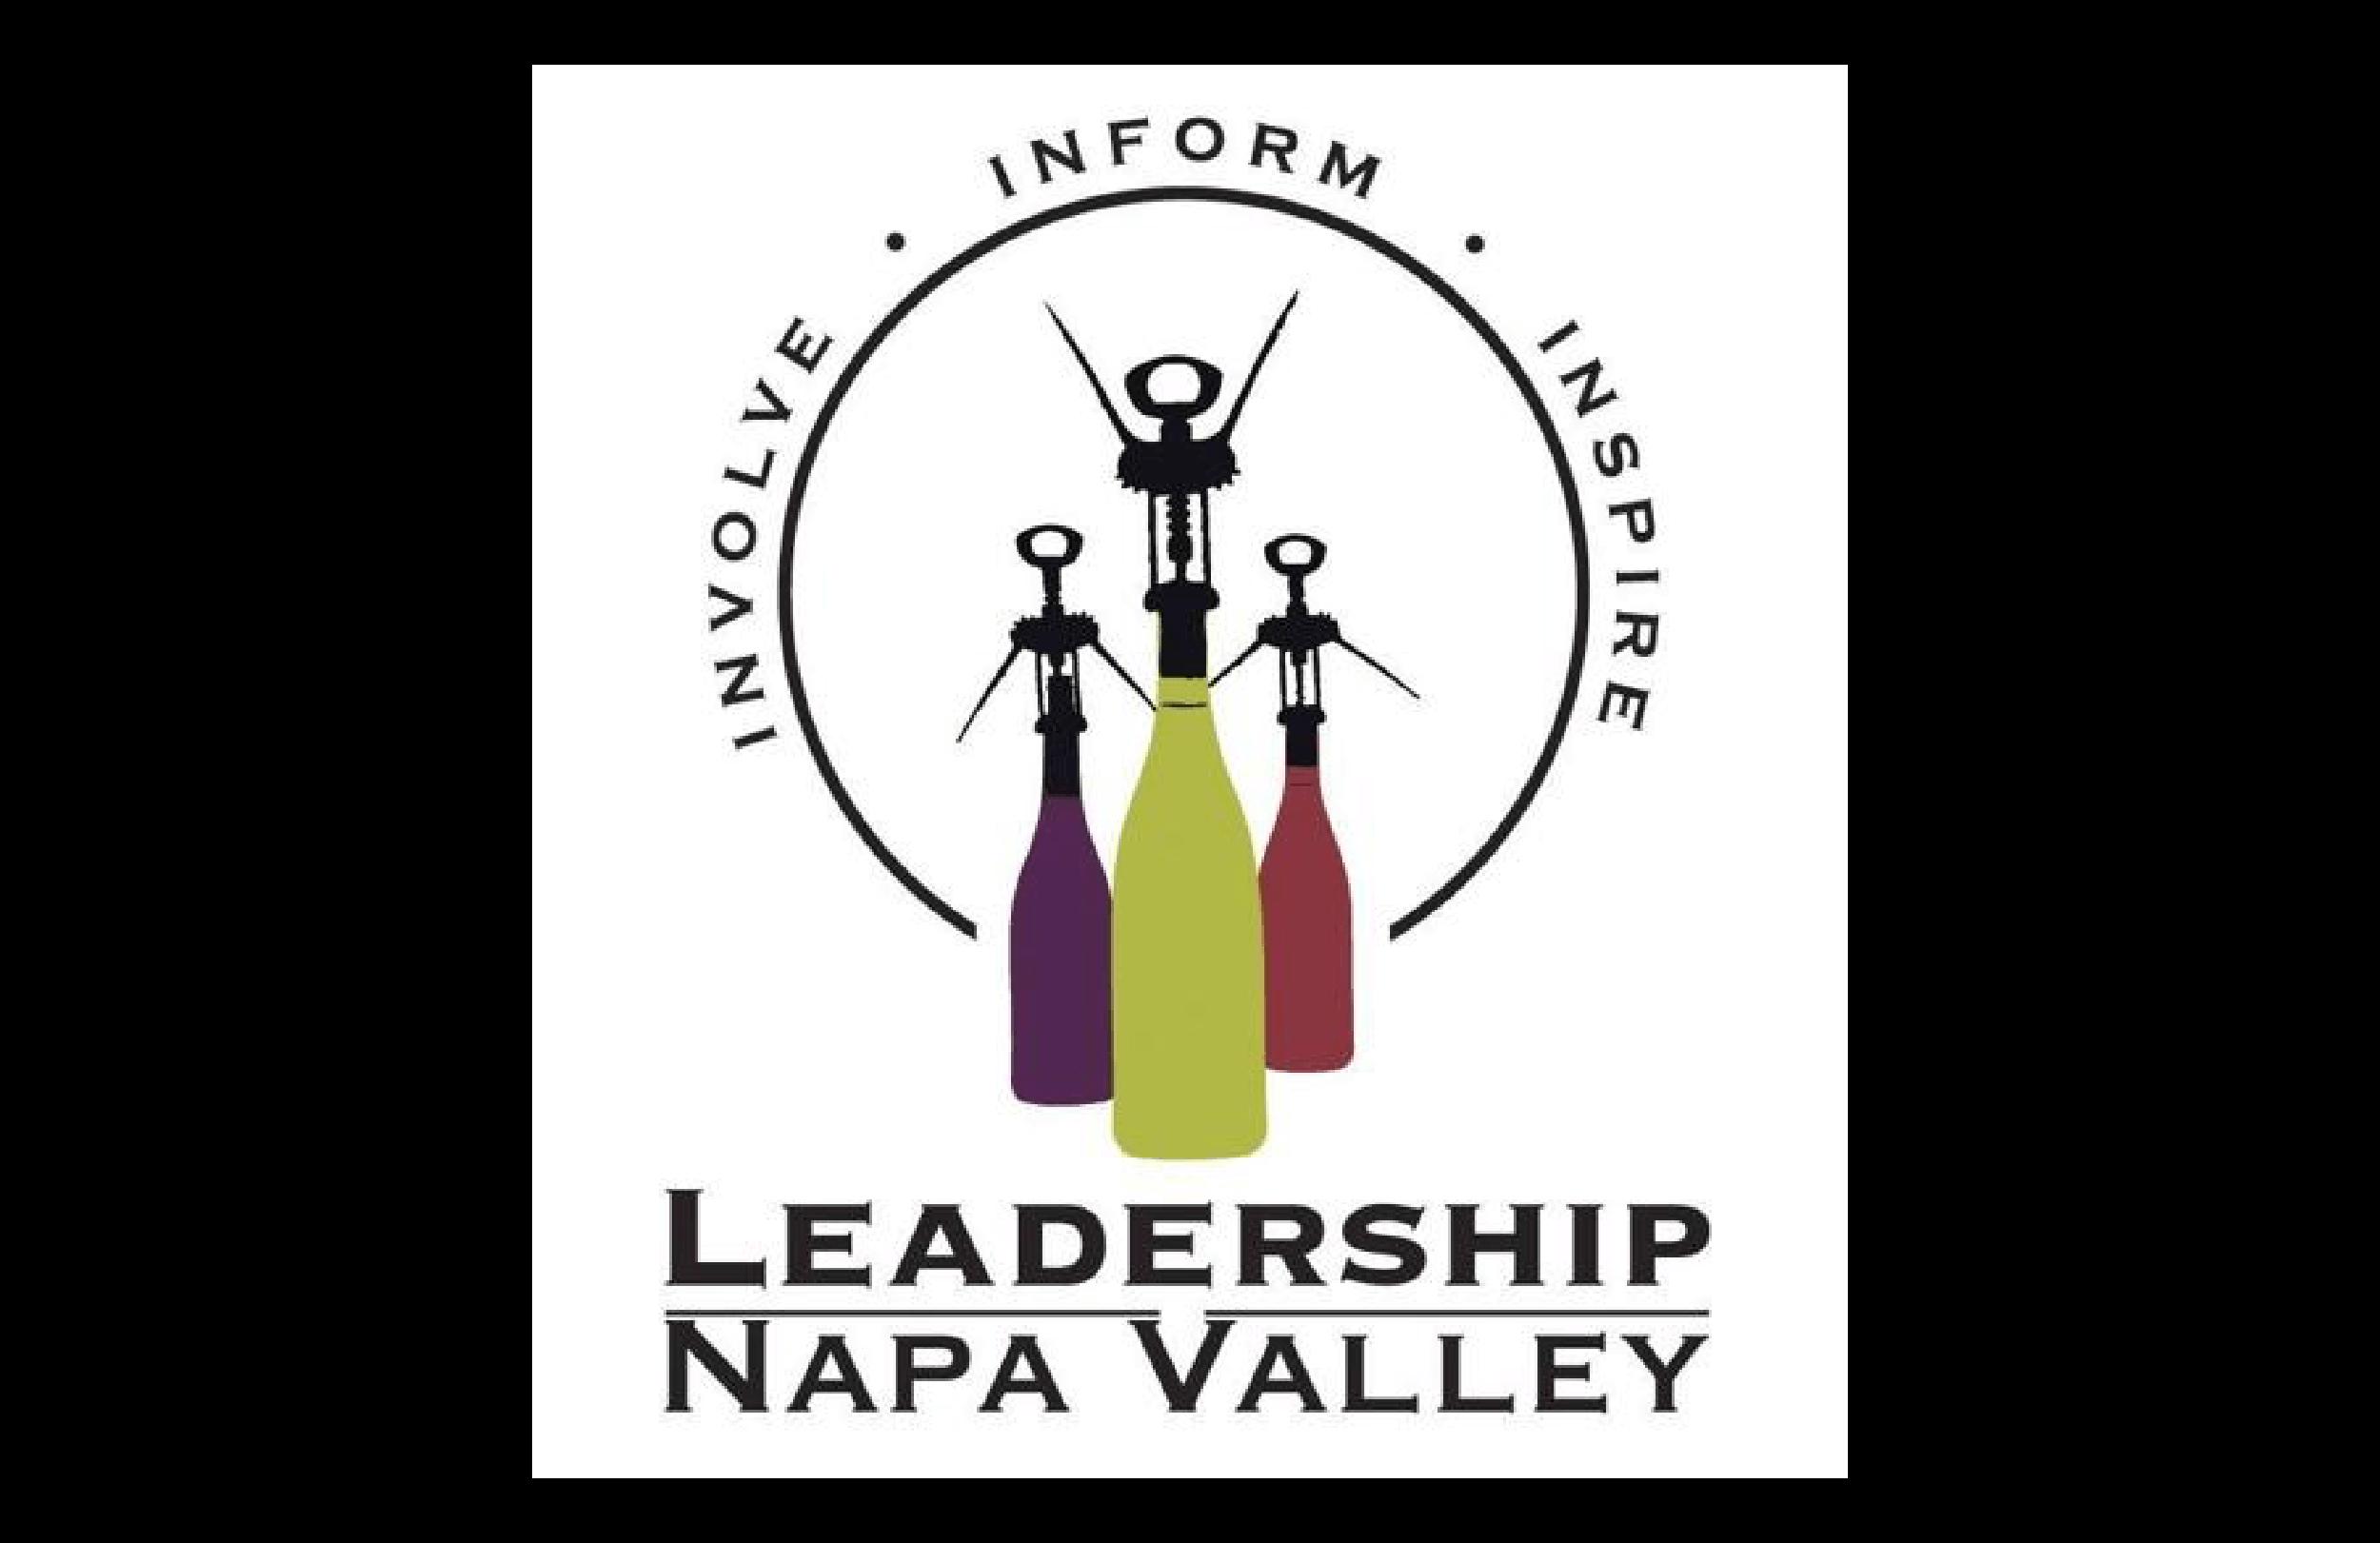 hello-ortho-philanthropy-logos-leadership-napa